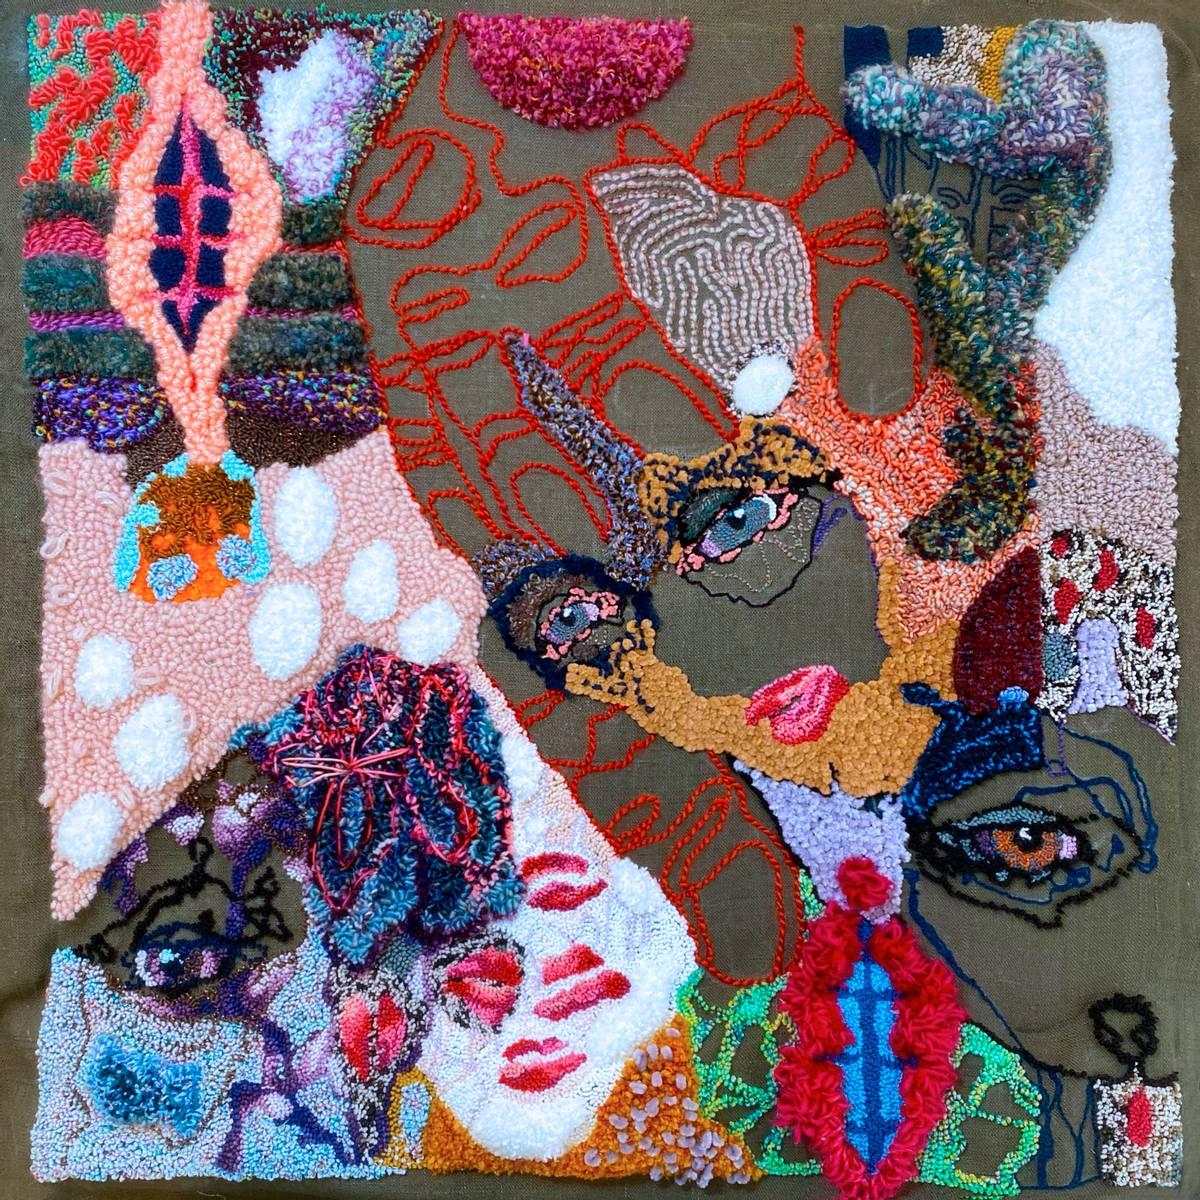 female work no. 4                  , Therese Myran